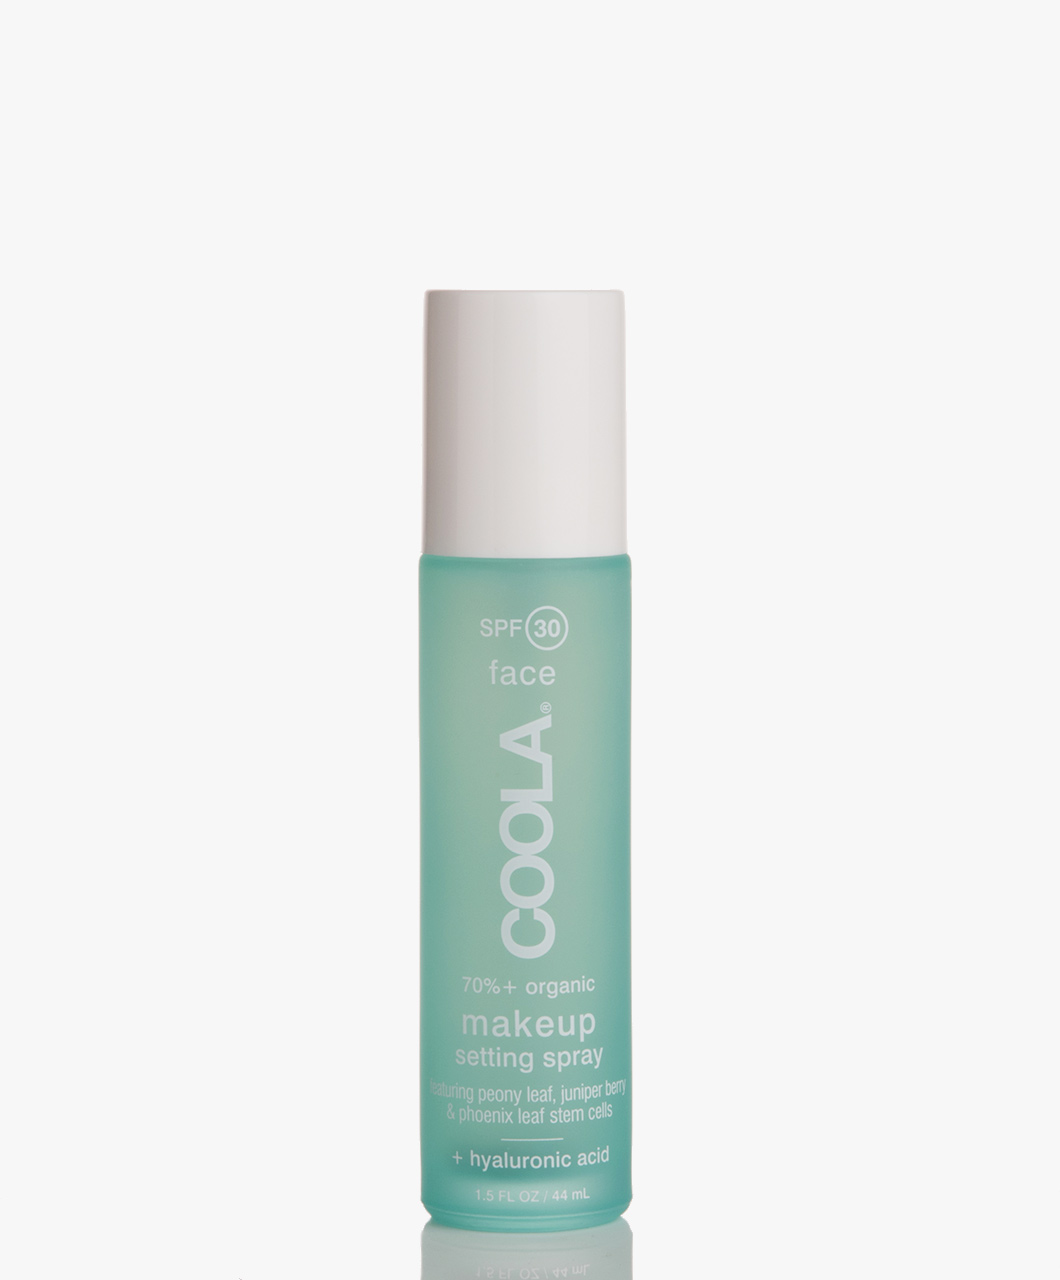 Afbeelding van COOLA Make Up Setting Spray SPF 30